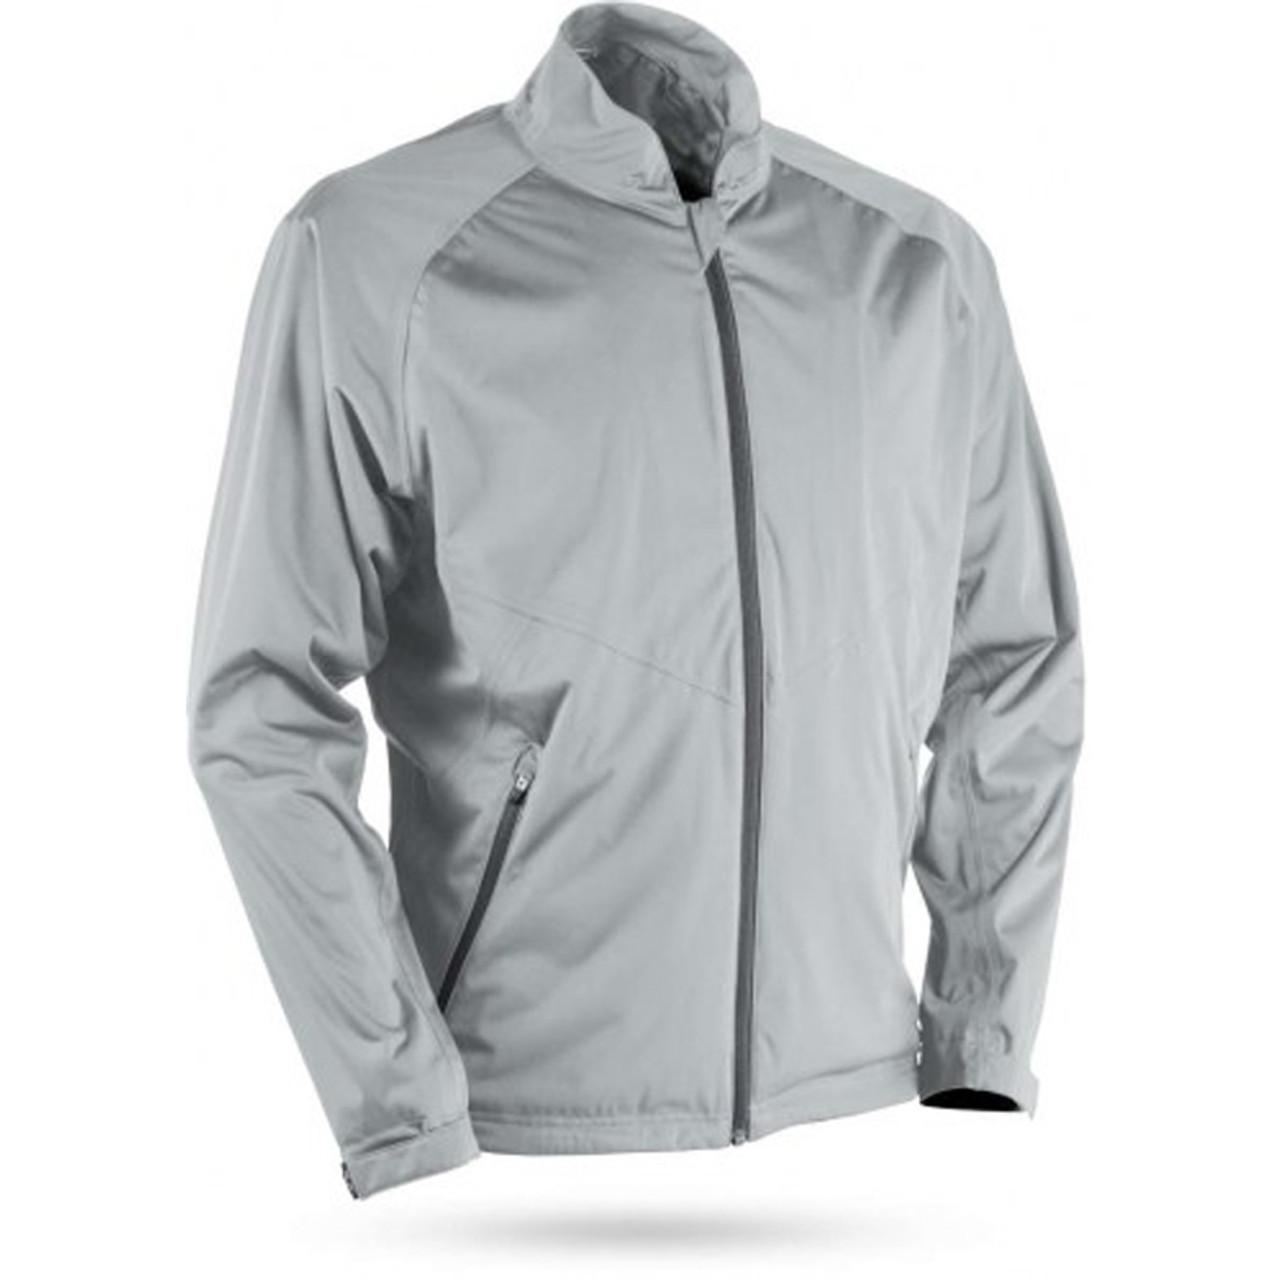 Sun Mountain RainFlex Elite Jacket - Platinum